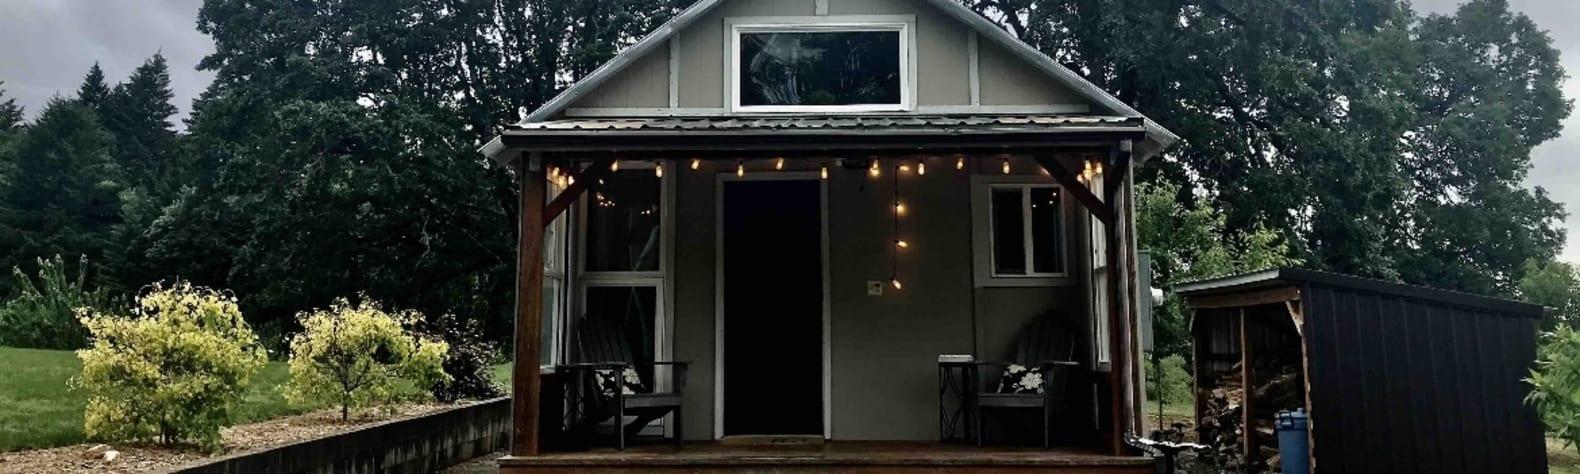 Quiet cabin on 100 acres